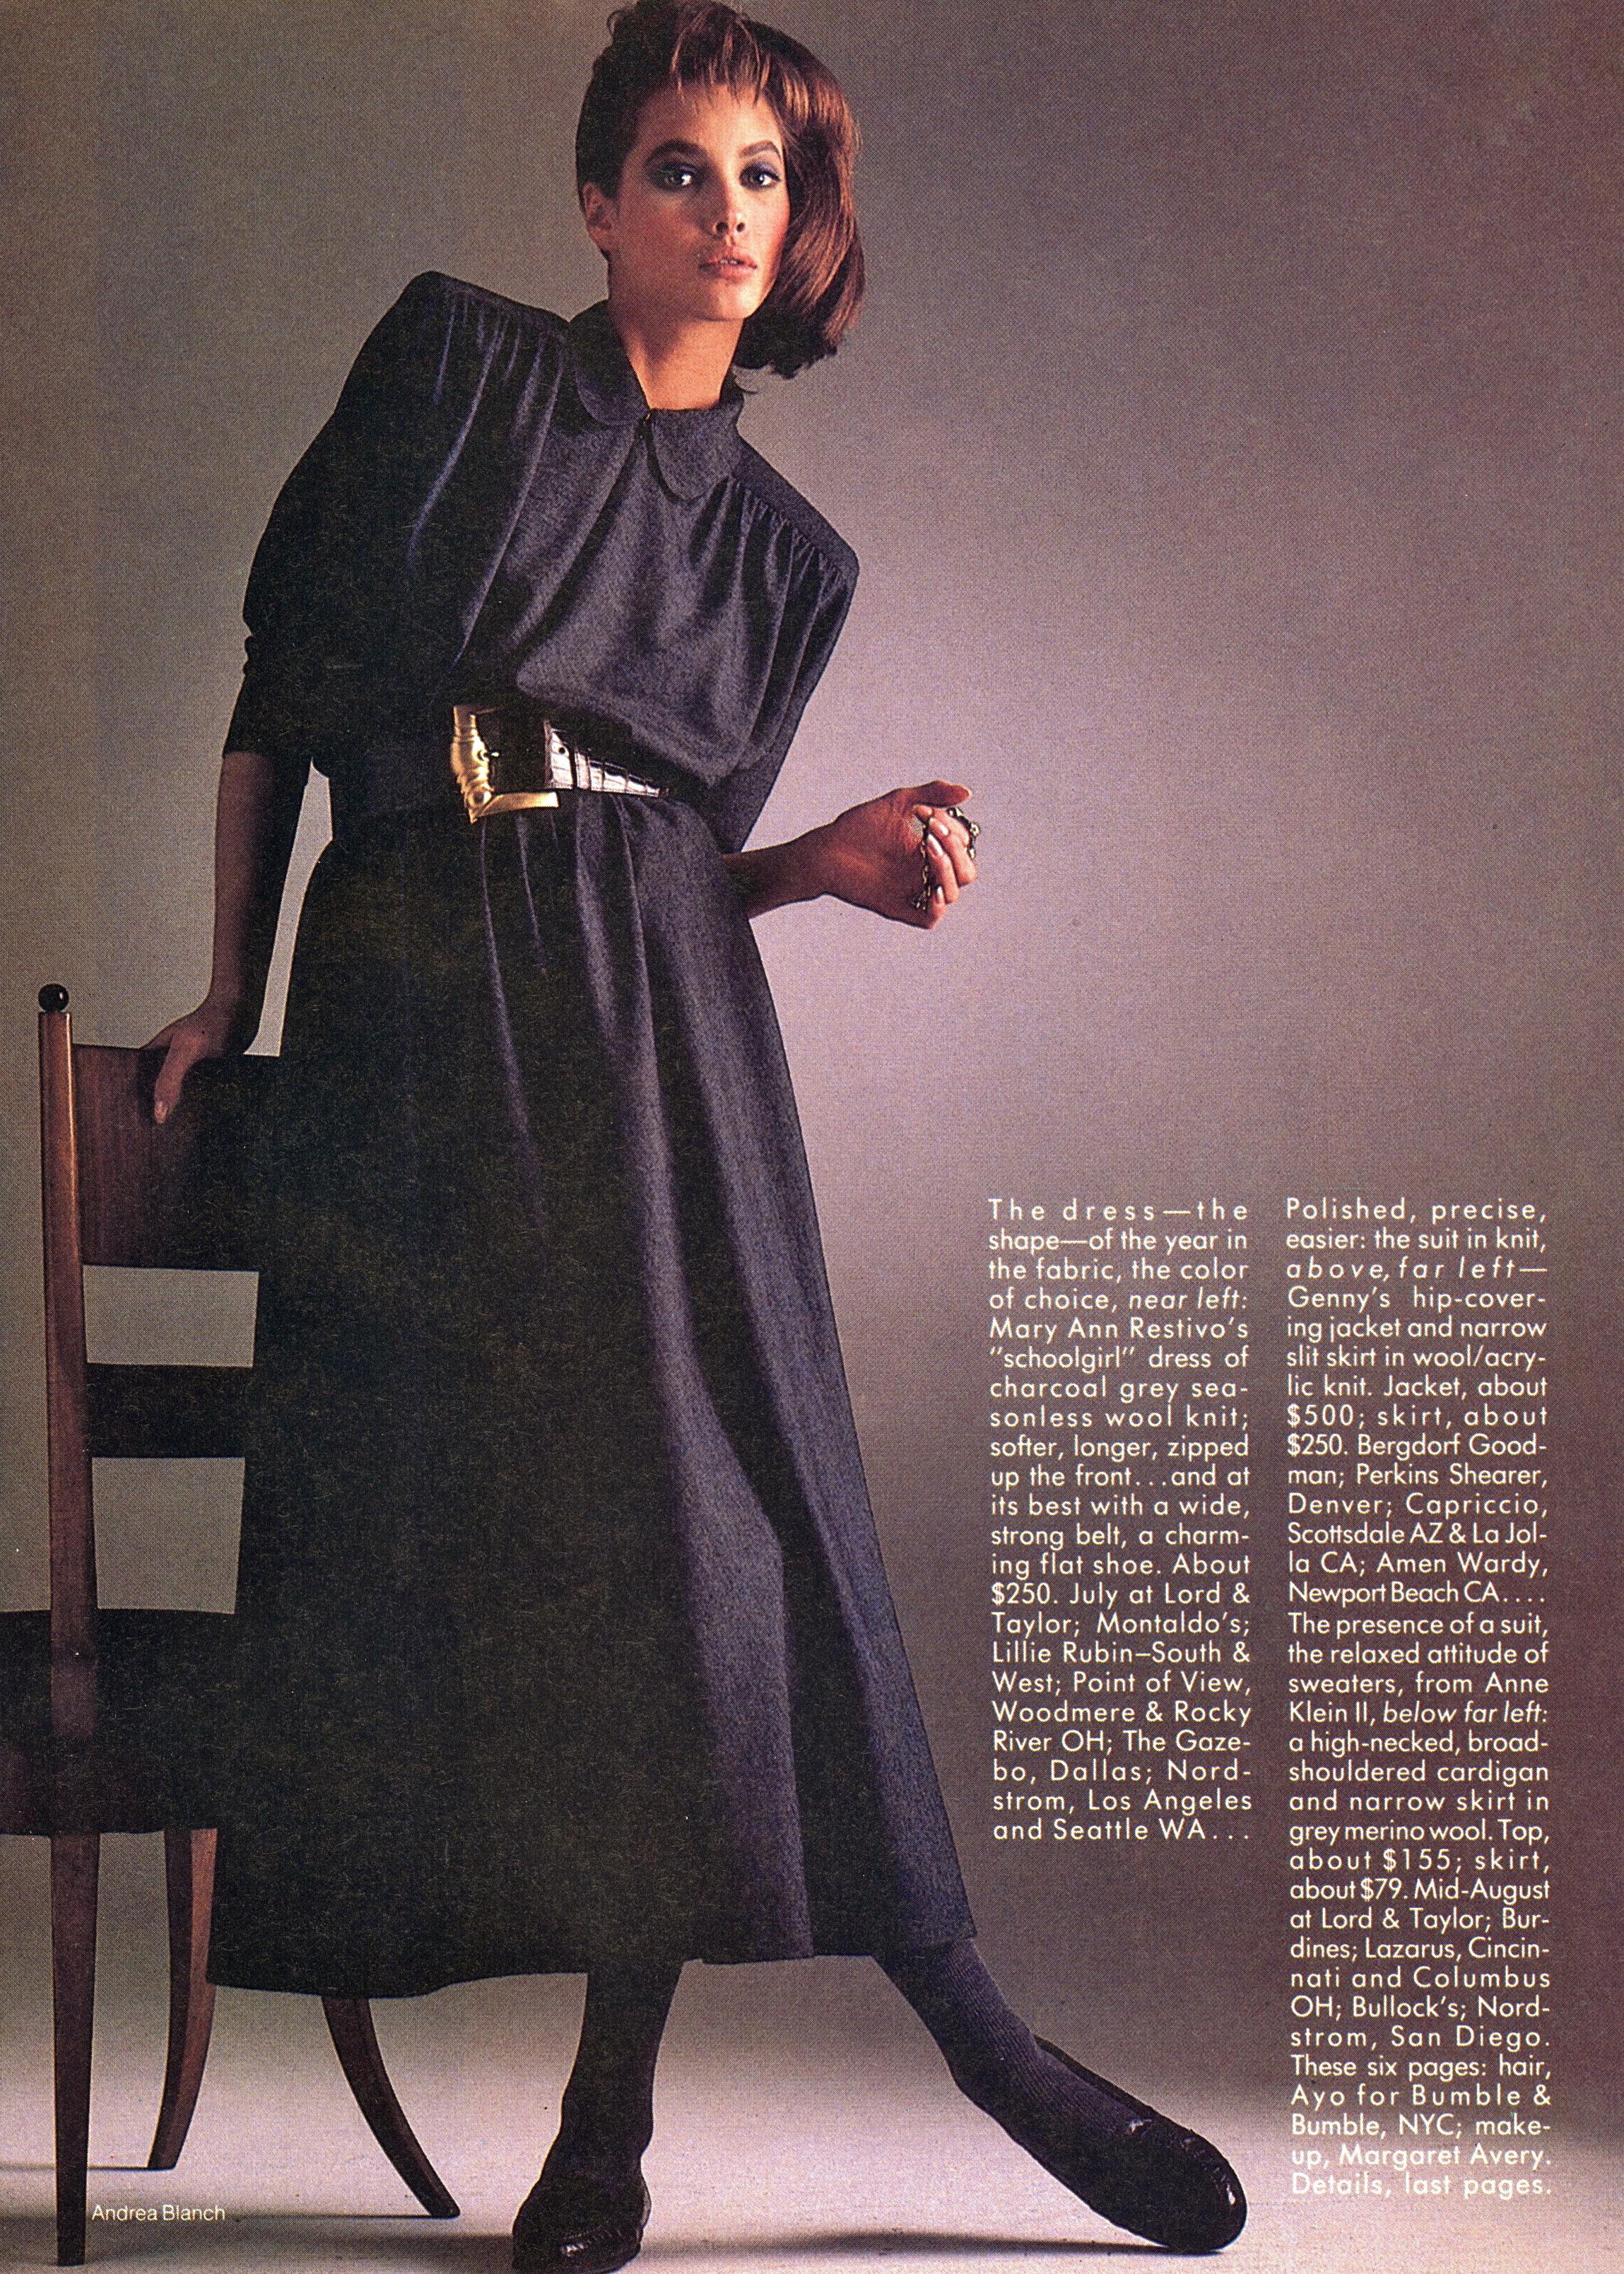 Vogue (US) June 1986 | Christy Turlington & Jose Toledo 04.jpg